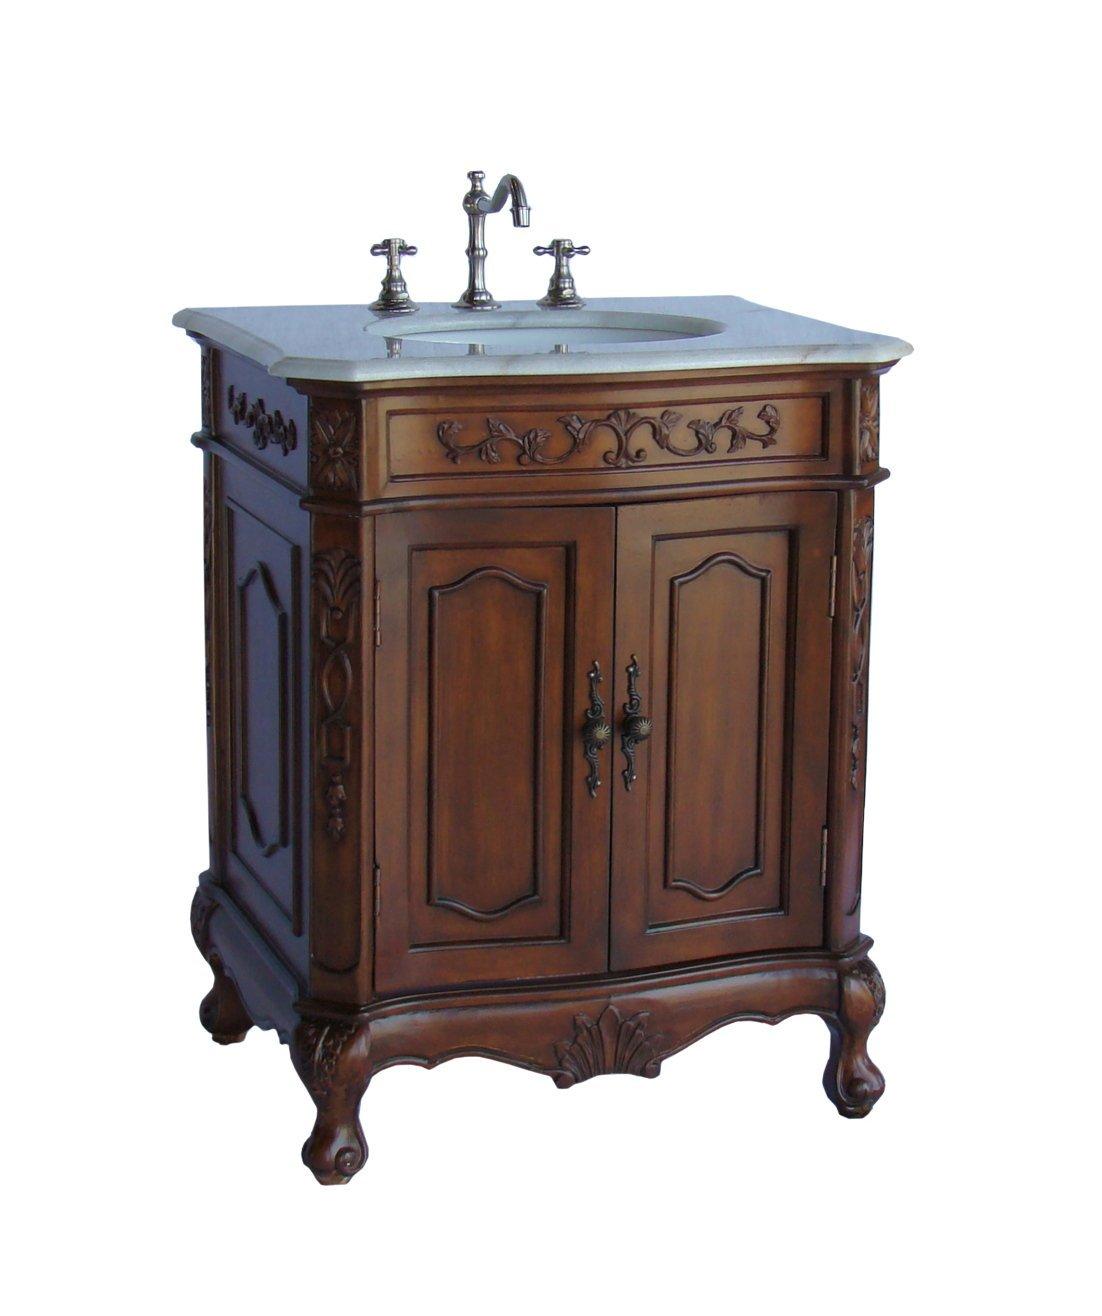 Adelina 27 inch Old Fashion Bathroom Vanity Walnut Finish